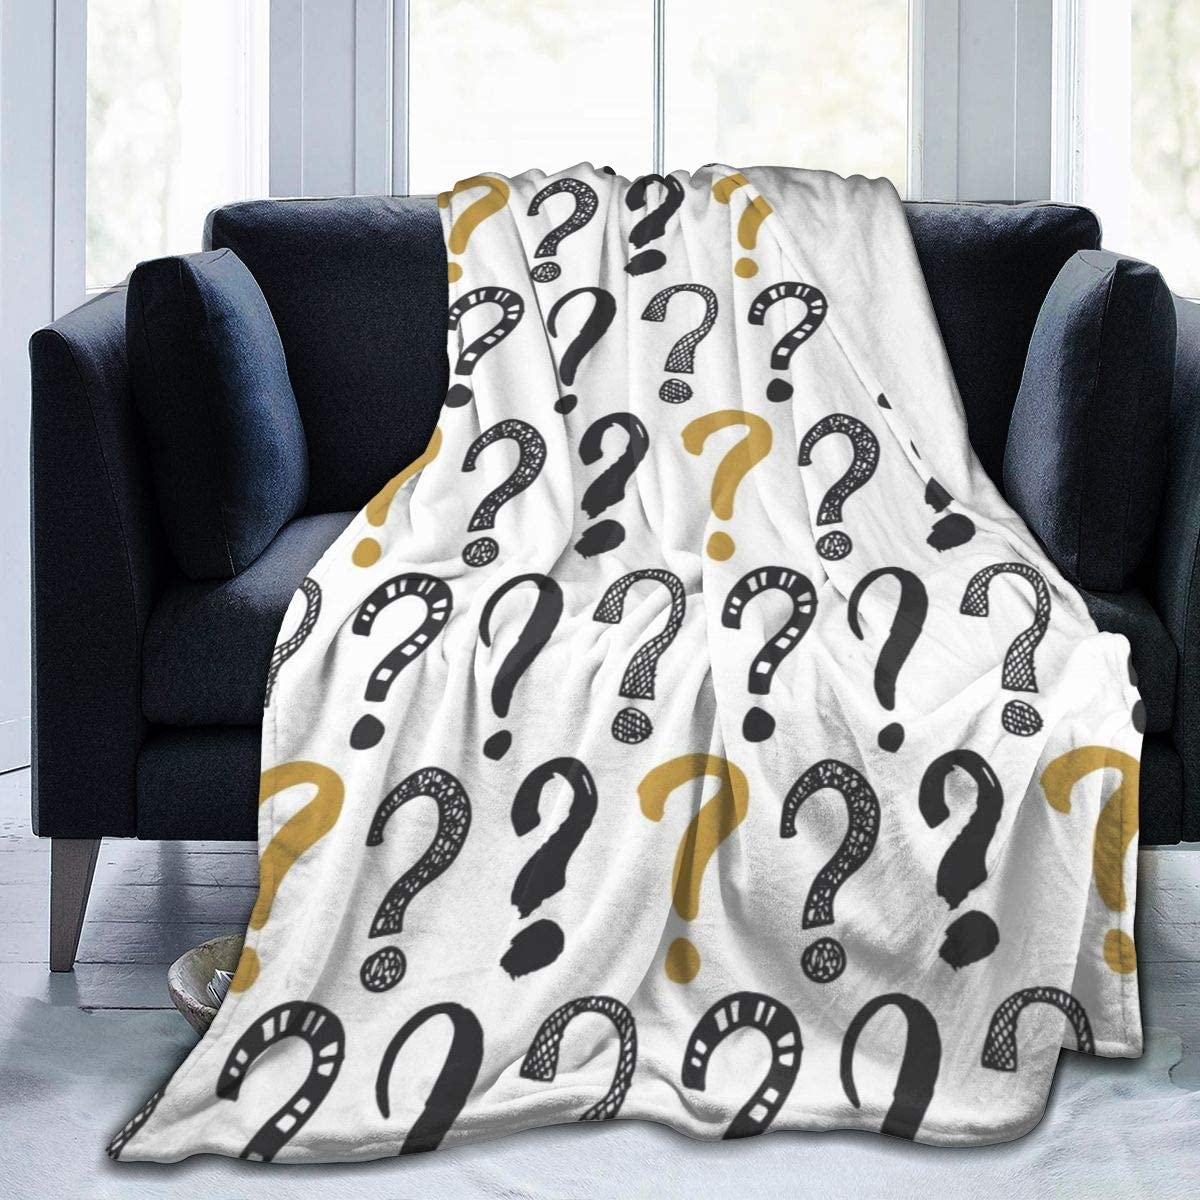 Gift the feeling of home and family! Home Sweet Home Family Plush Fleece Winter Blanket